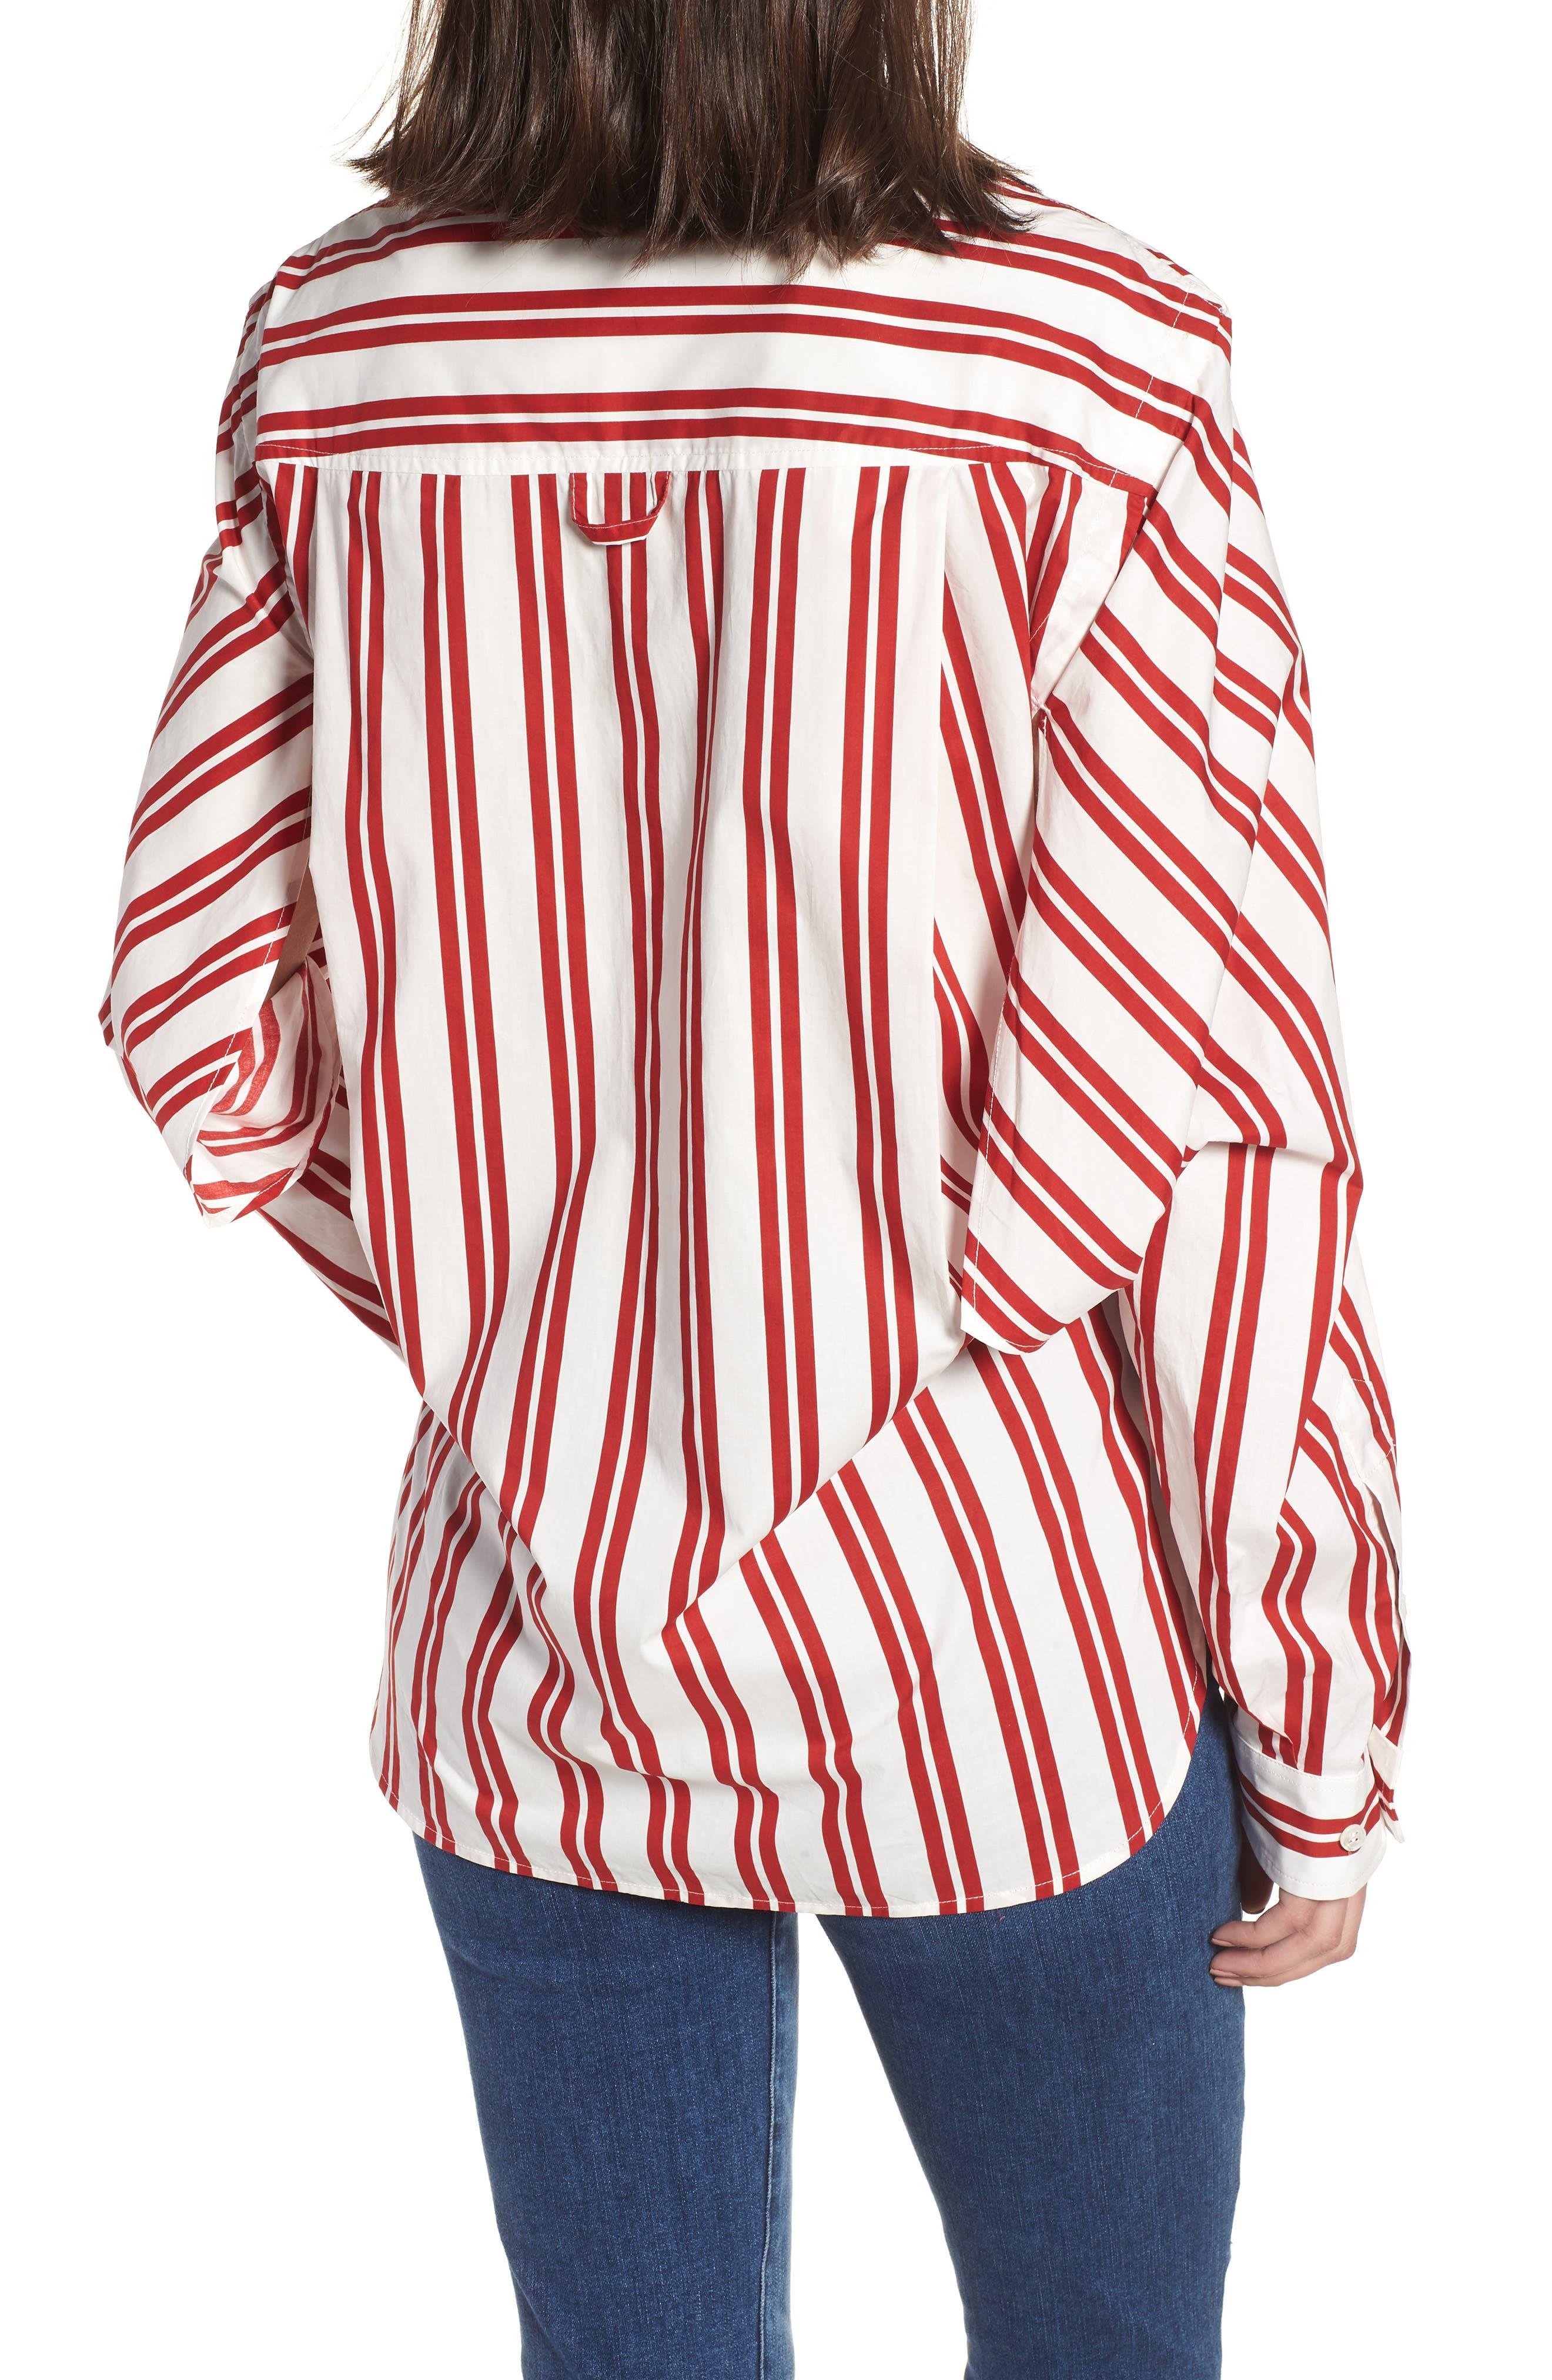 Hug Me Tie Hem Shirt,                             Alternate thumbnail 2, color,                             640